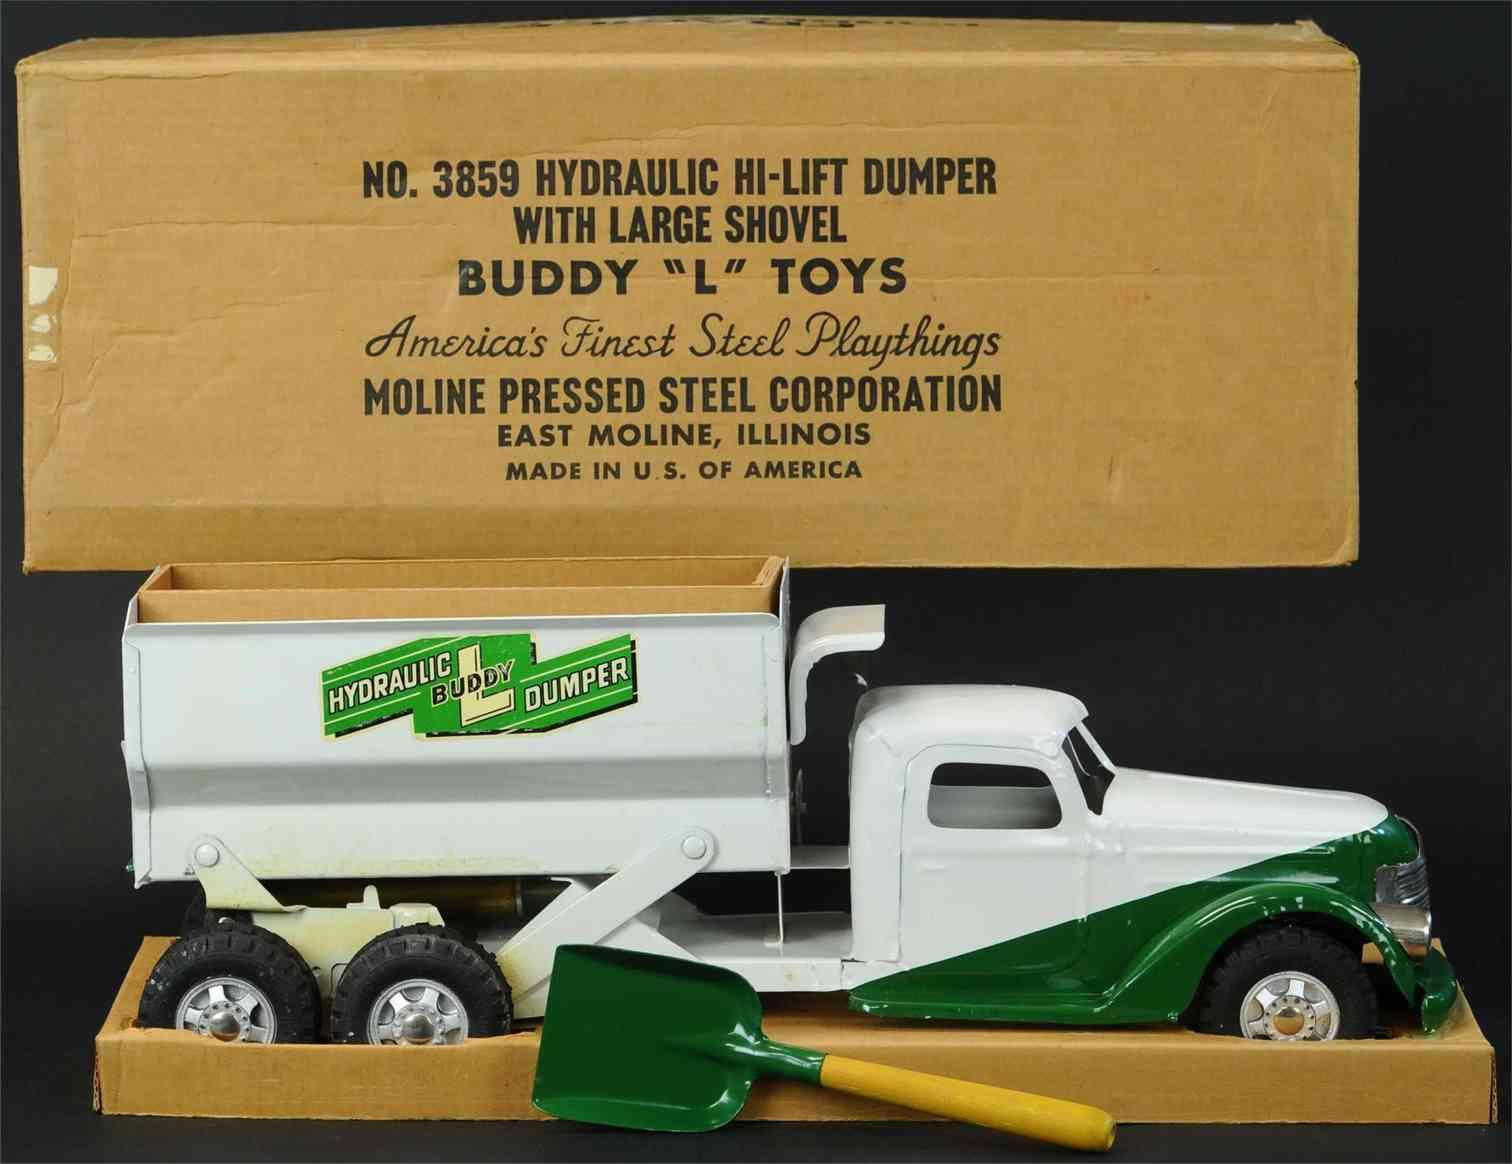 buddy l 3859 stahlblech spielzeug hydrauischer kipplastwagen gruen weiss